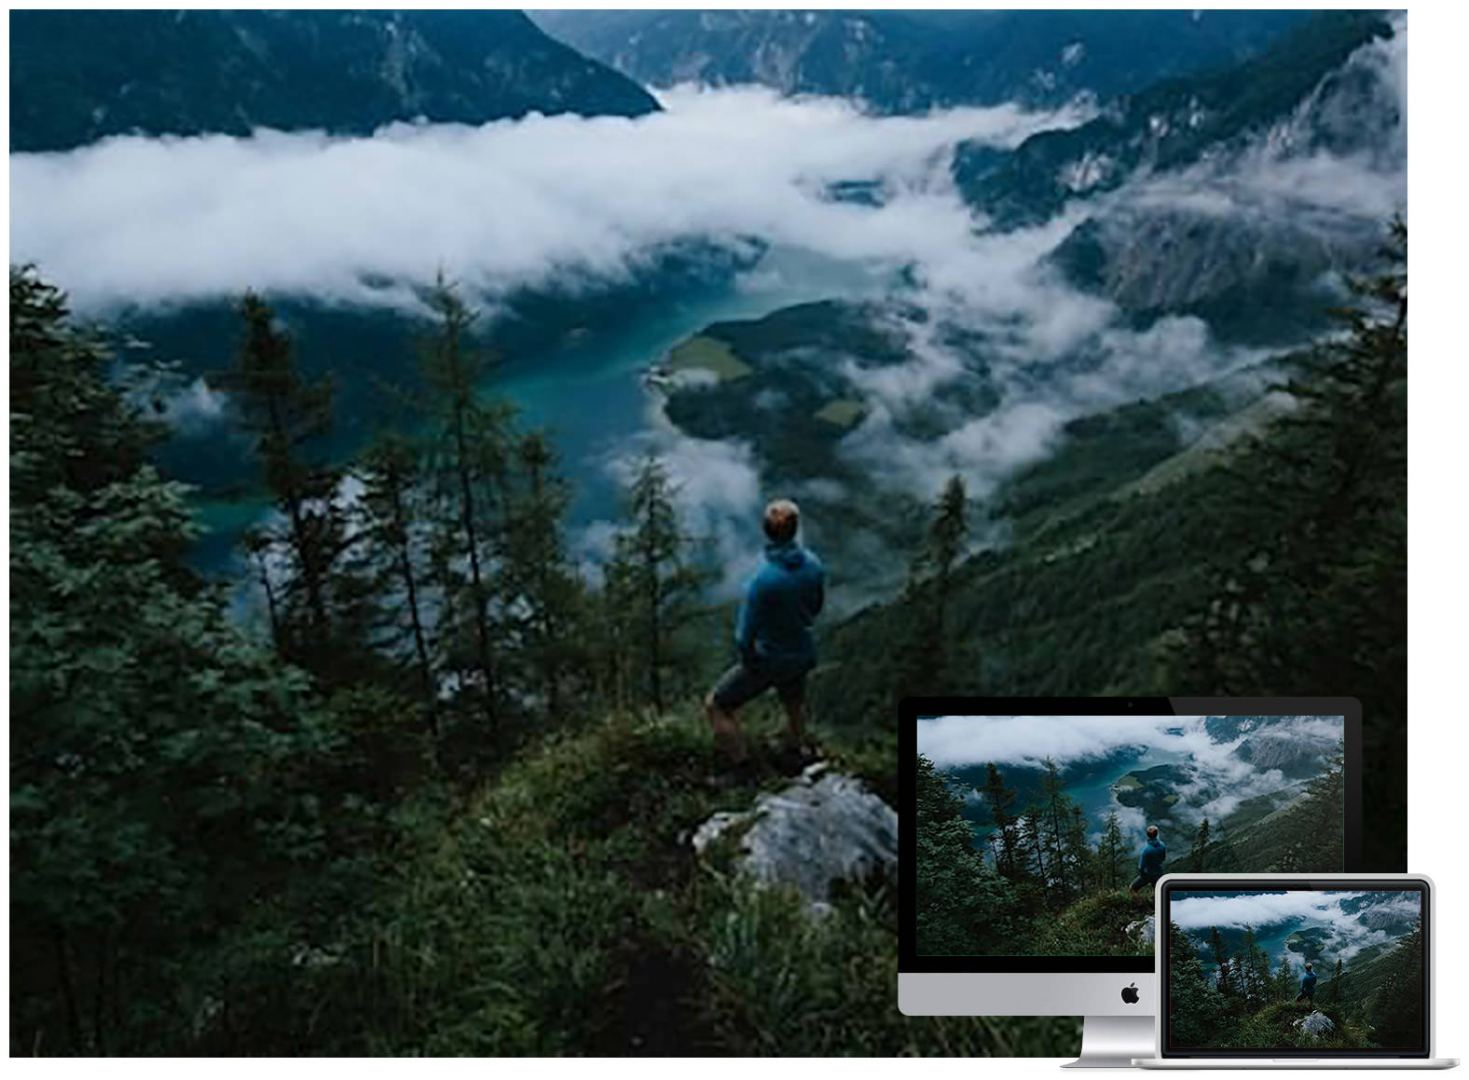 man-mountains-clouds-travel-wallpaper